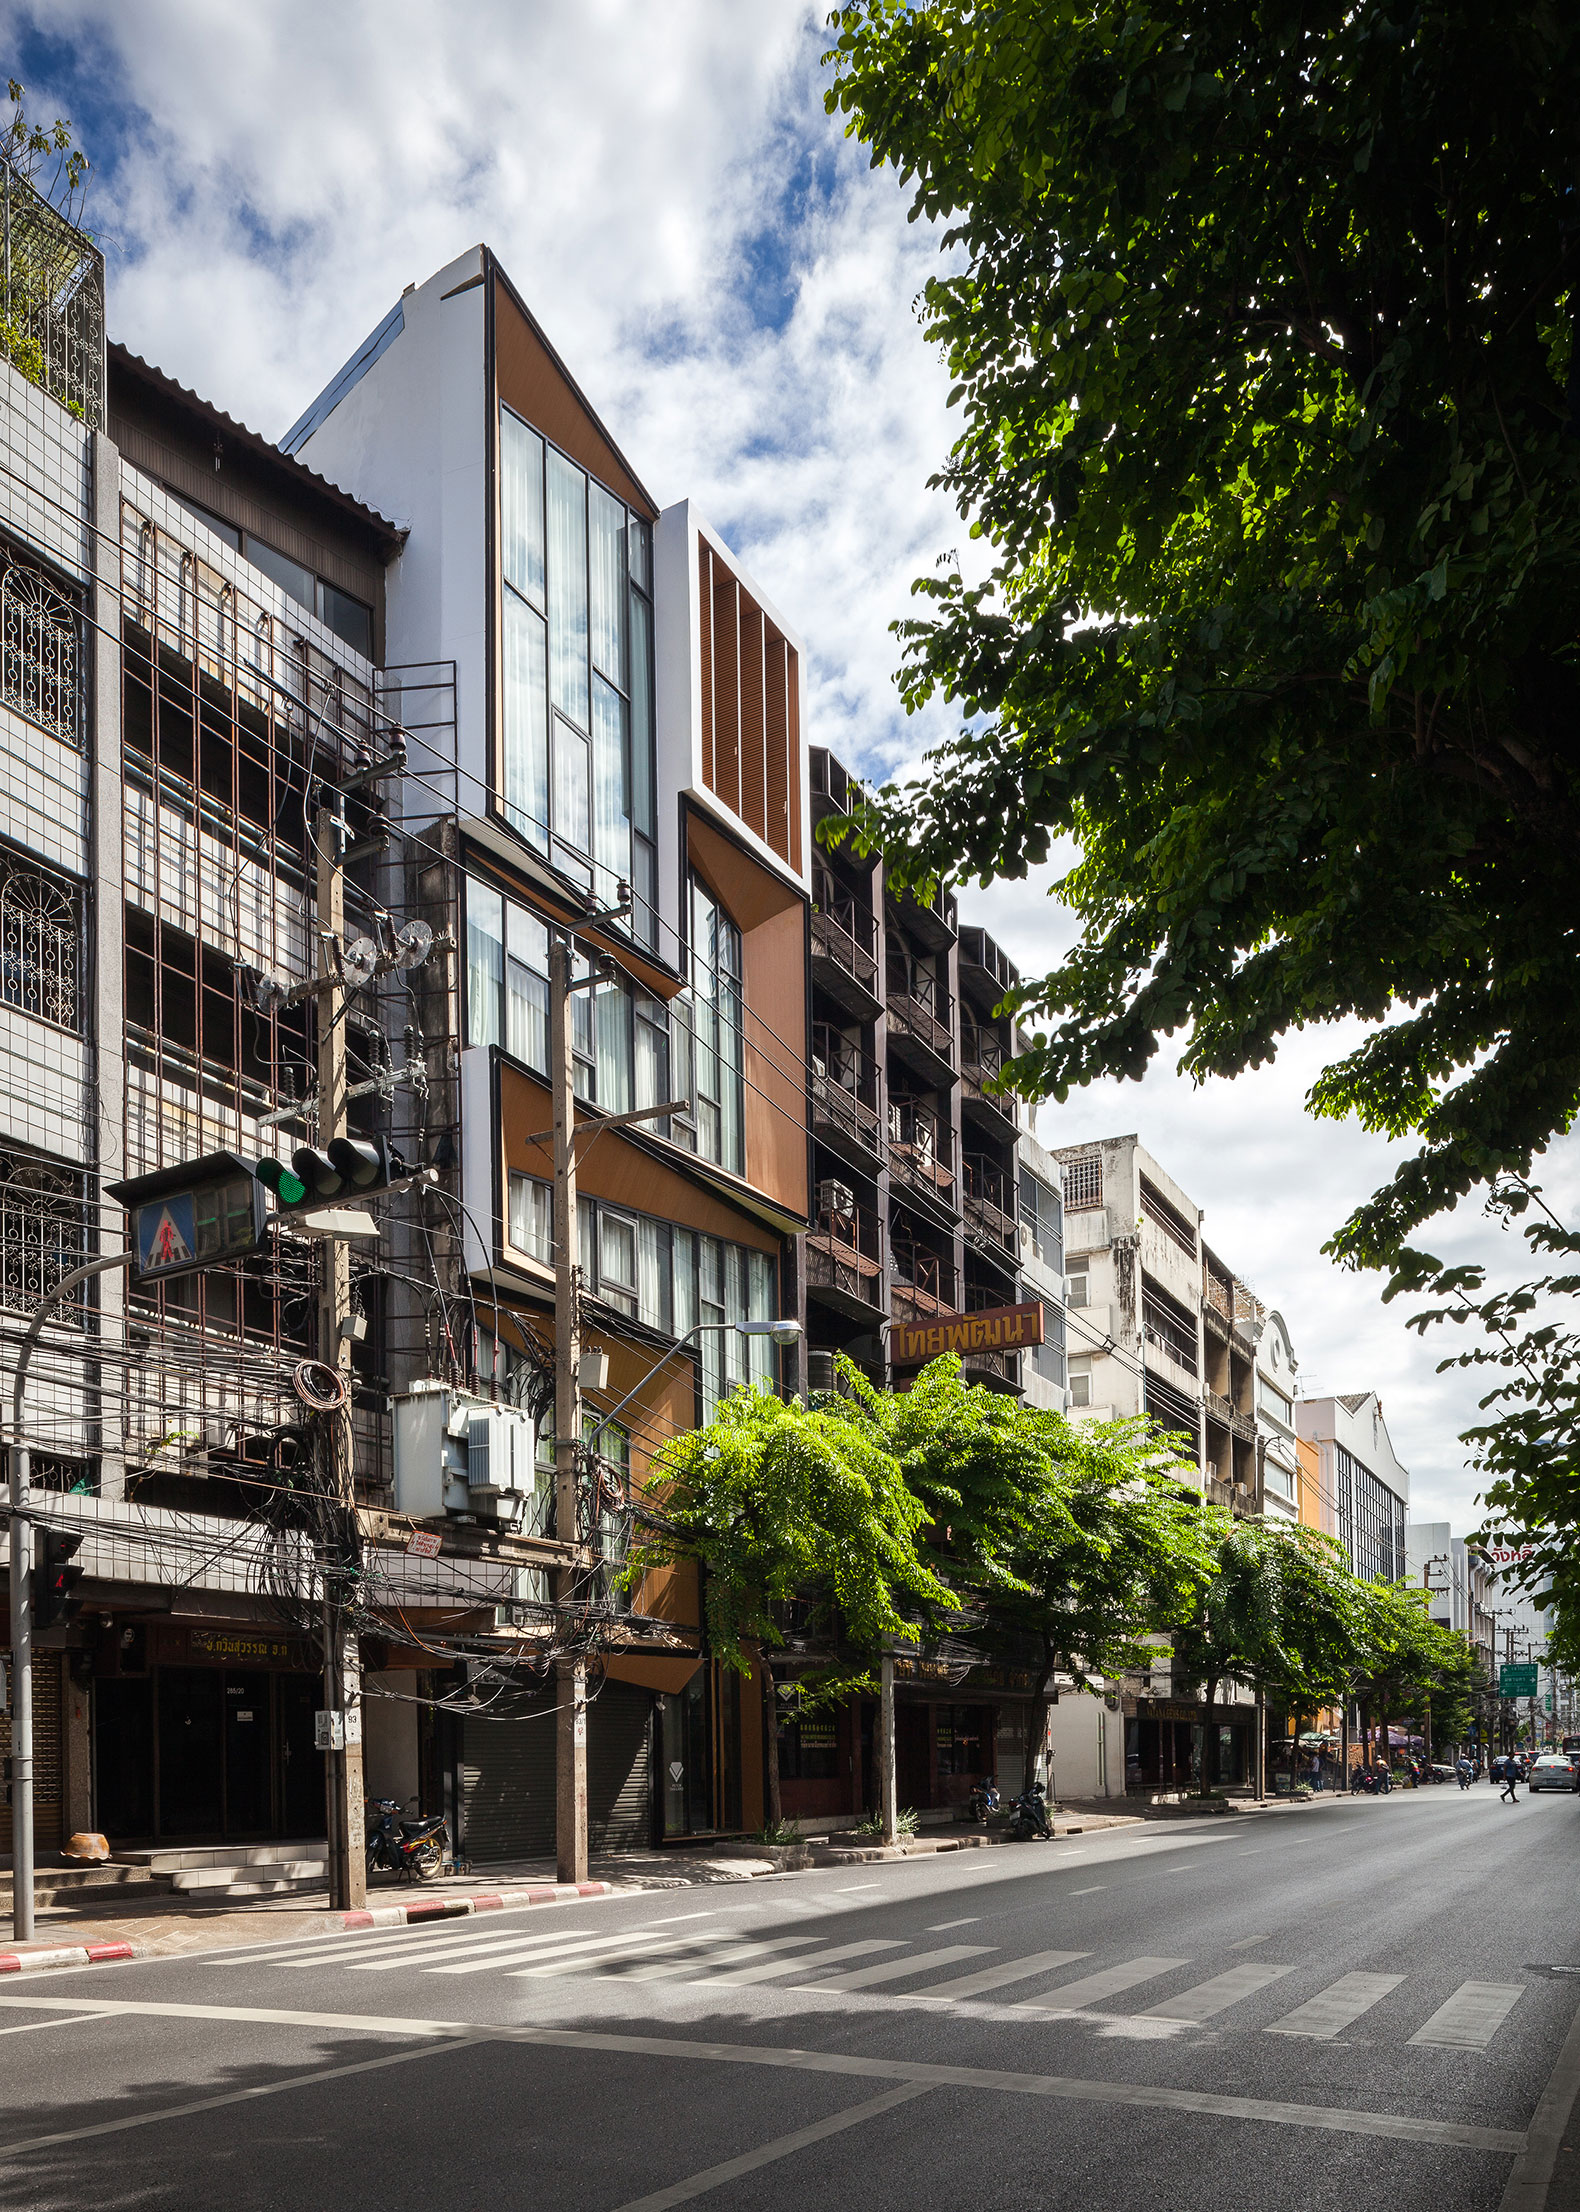 Vista exterior. Siri House por IDIN Architects. Fotografía © Spaceshift Studio